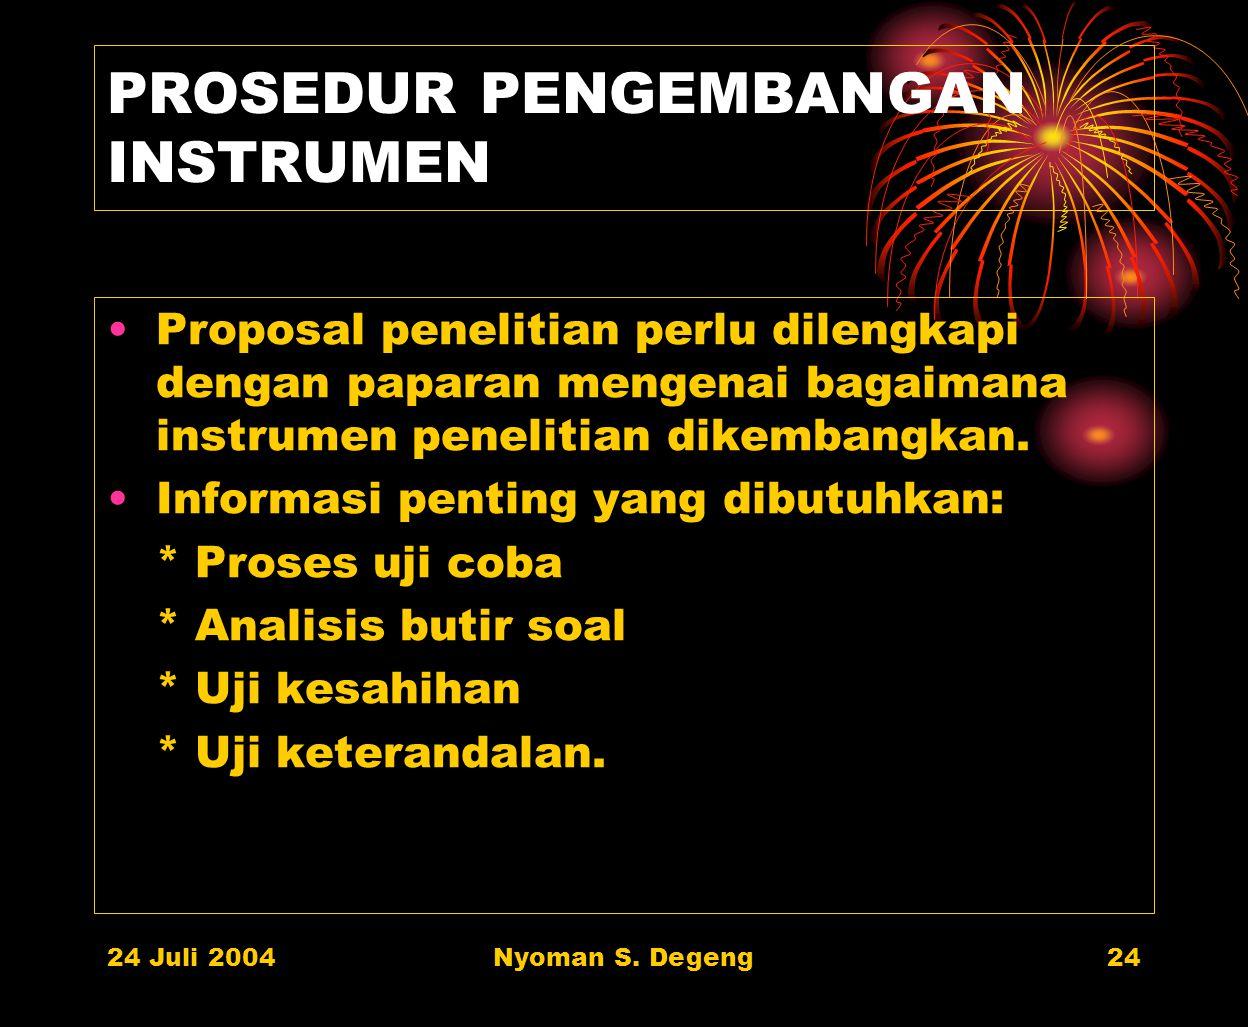 24 Juli 2004Nyoman S. Degeng23 INSTRUMEN PENGUKURAN VARIABEL Proposal penelitian perlu dilengkapi dengan instrumen yang akan dipakai untuk mengukur va